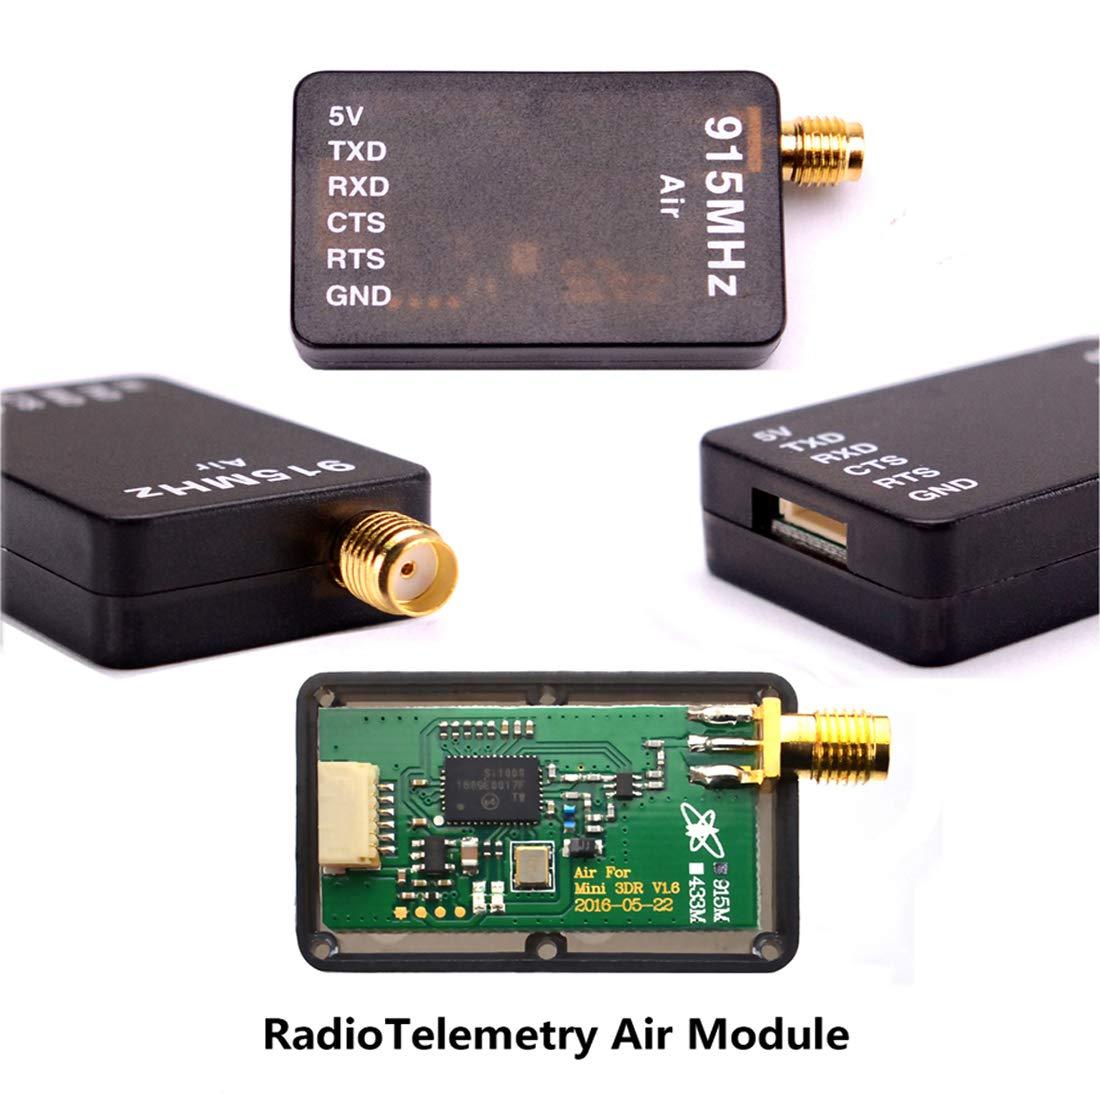 Readytosky 3DR Radio Telemetry Kit 915Mhz 100mW Air + Ground Module Open  Source for Standard Version APM2 6 APM2 8 pixhawk 2 4 6 2 4 8 Flight